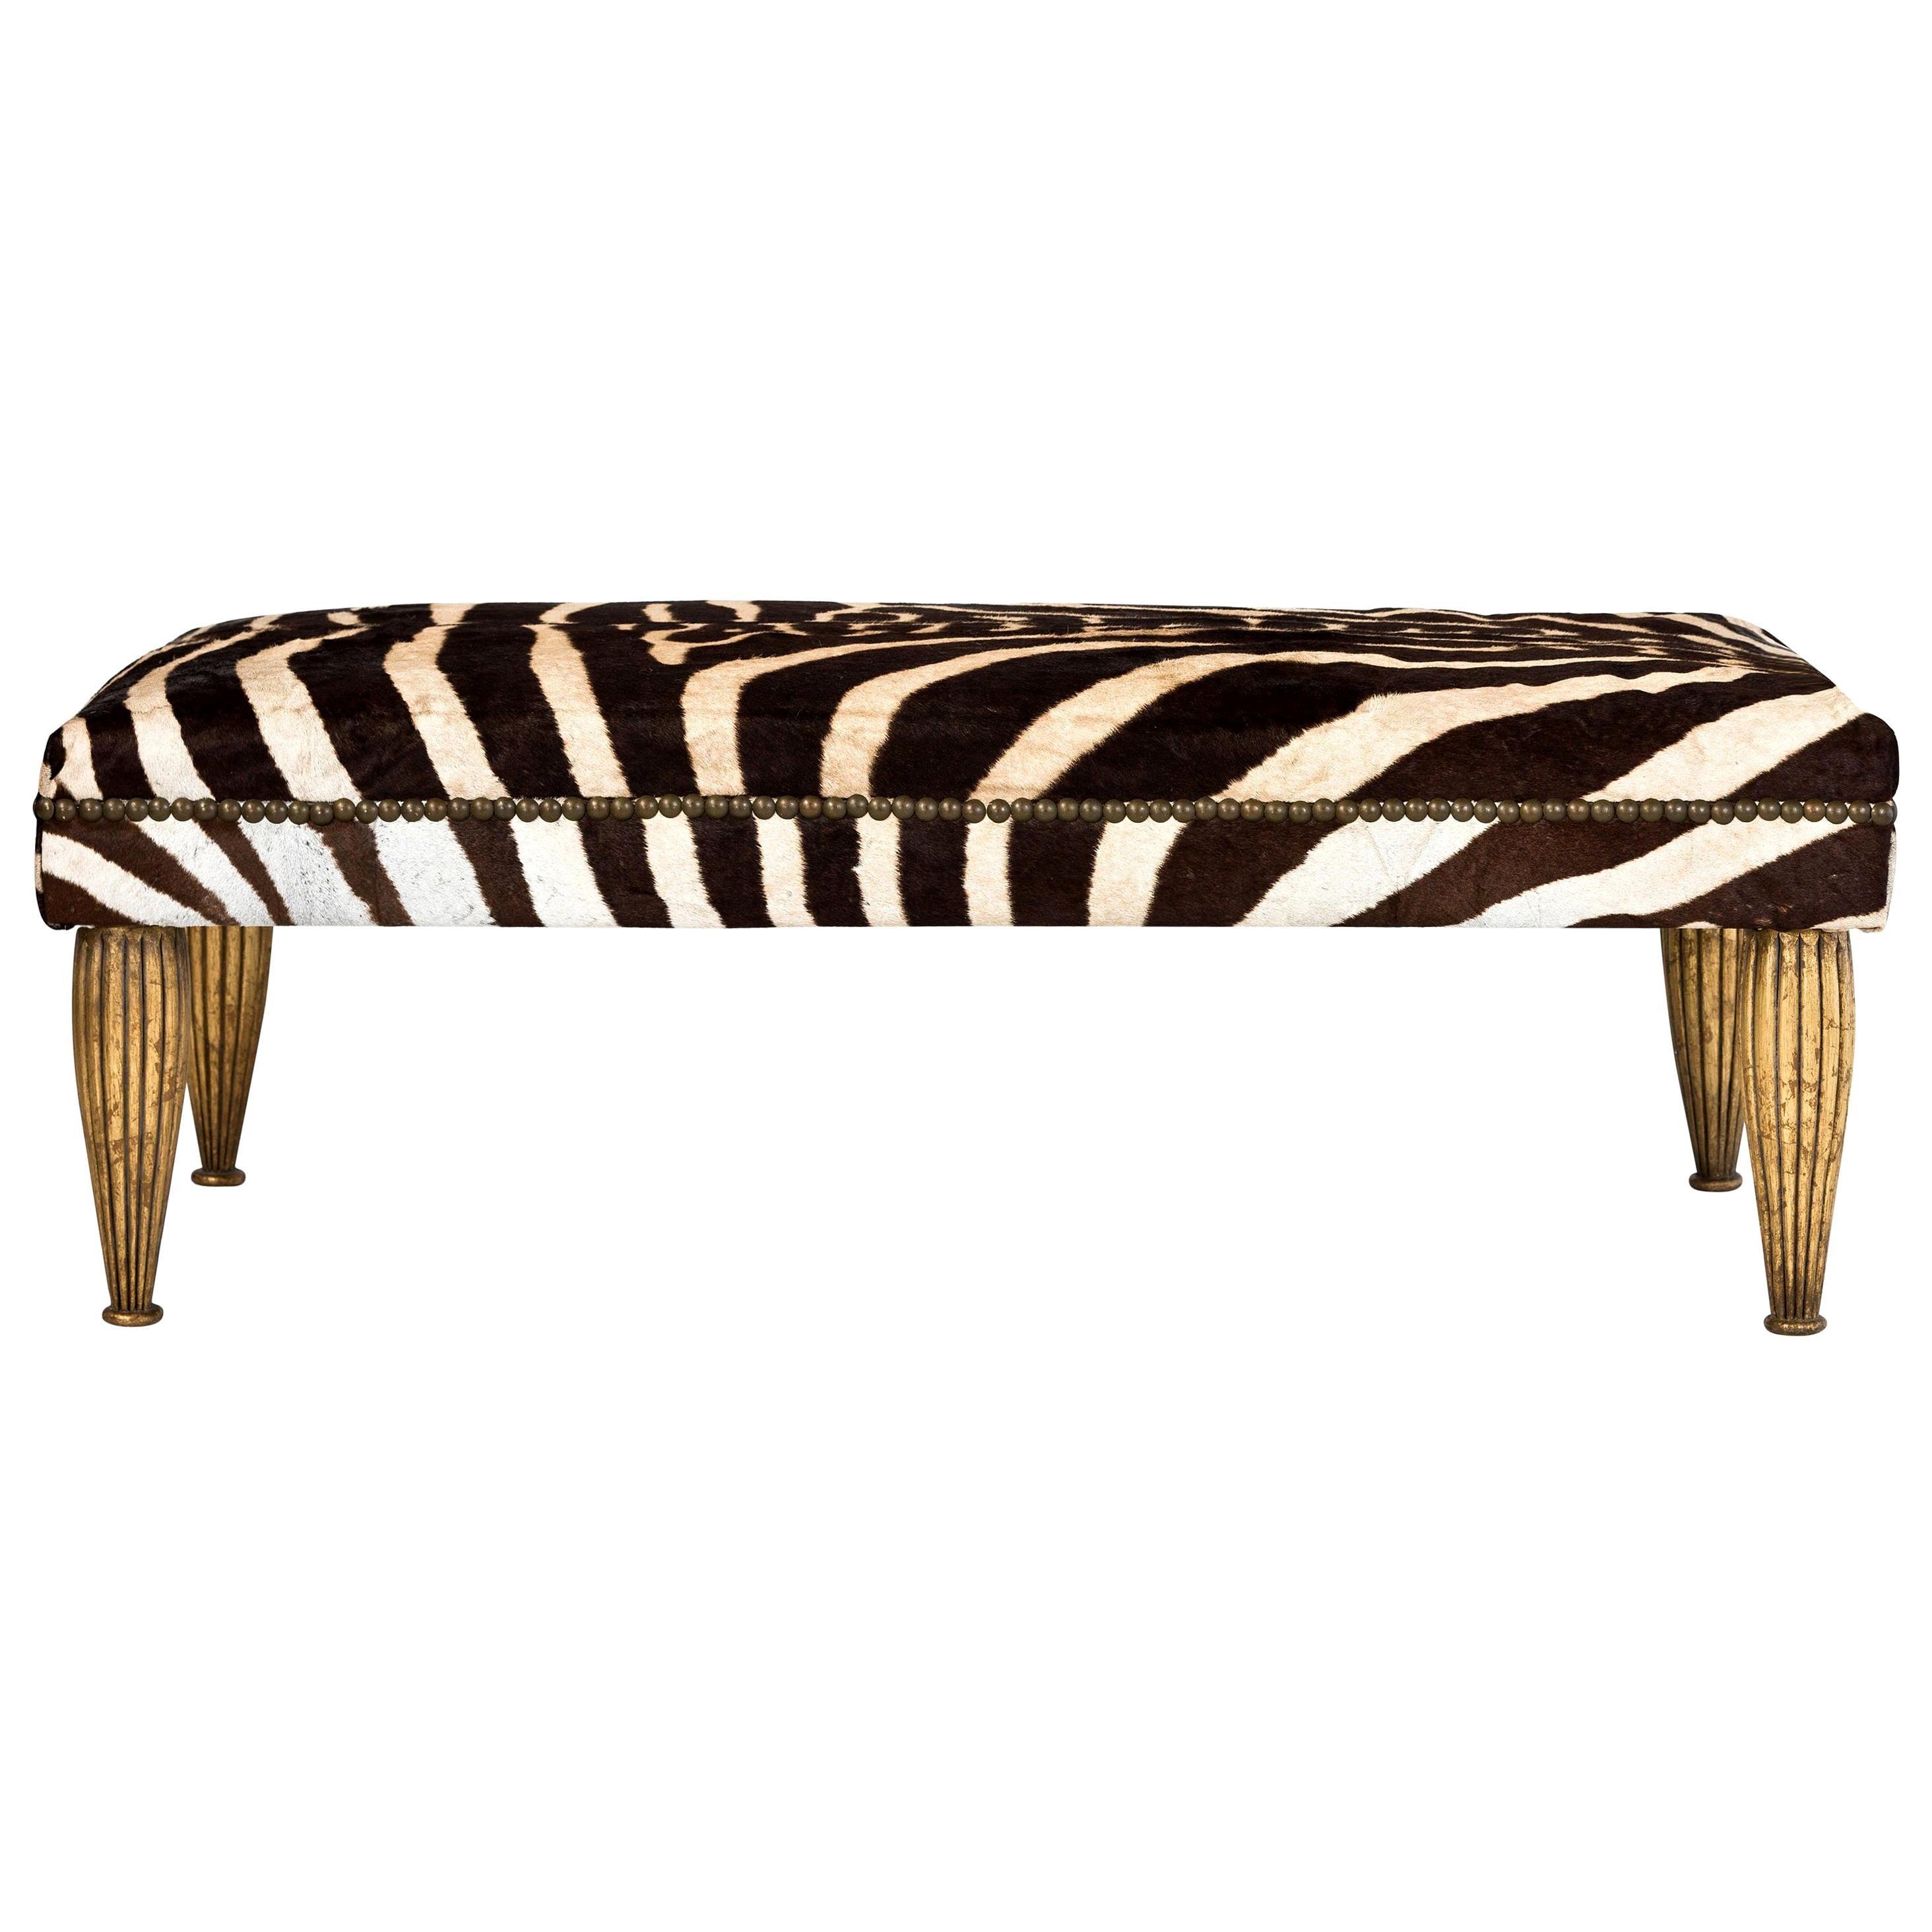 Zebra Bench with Gold Gilt Legs